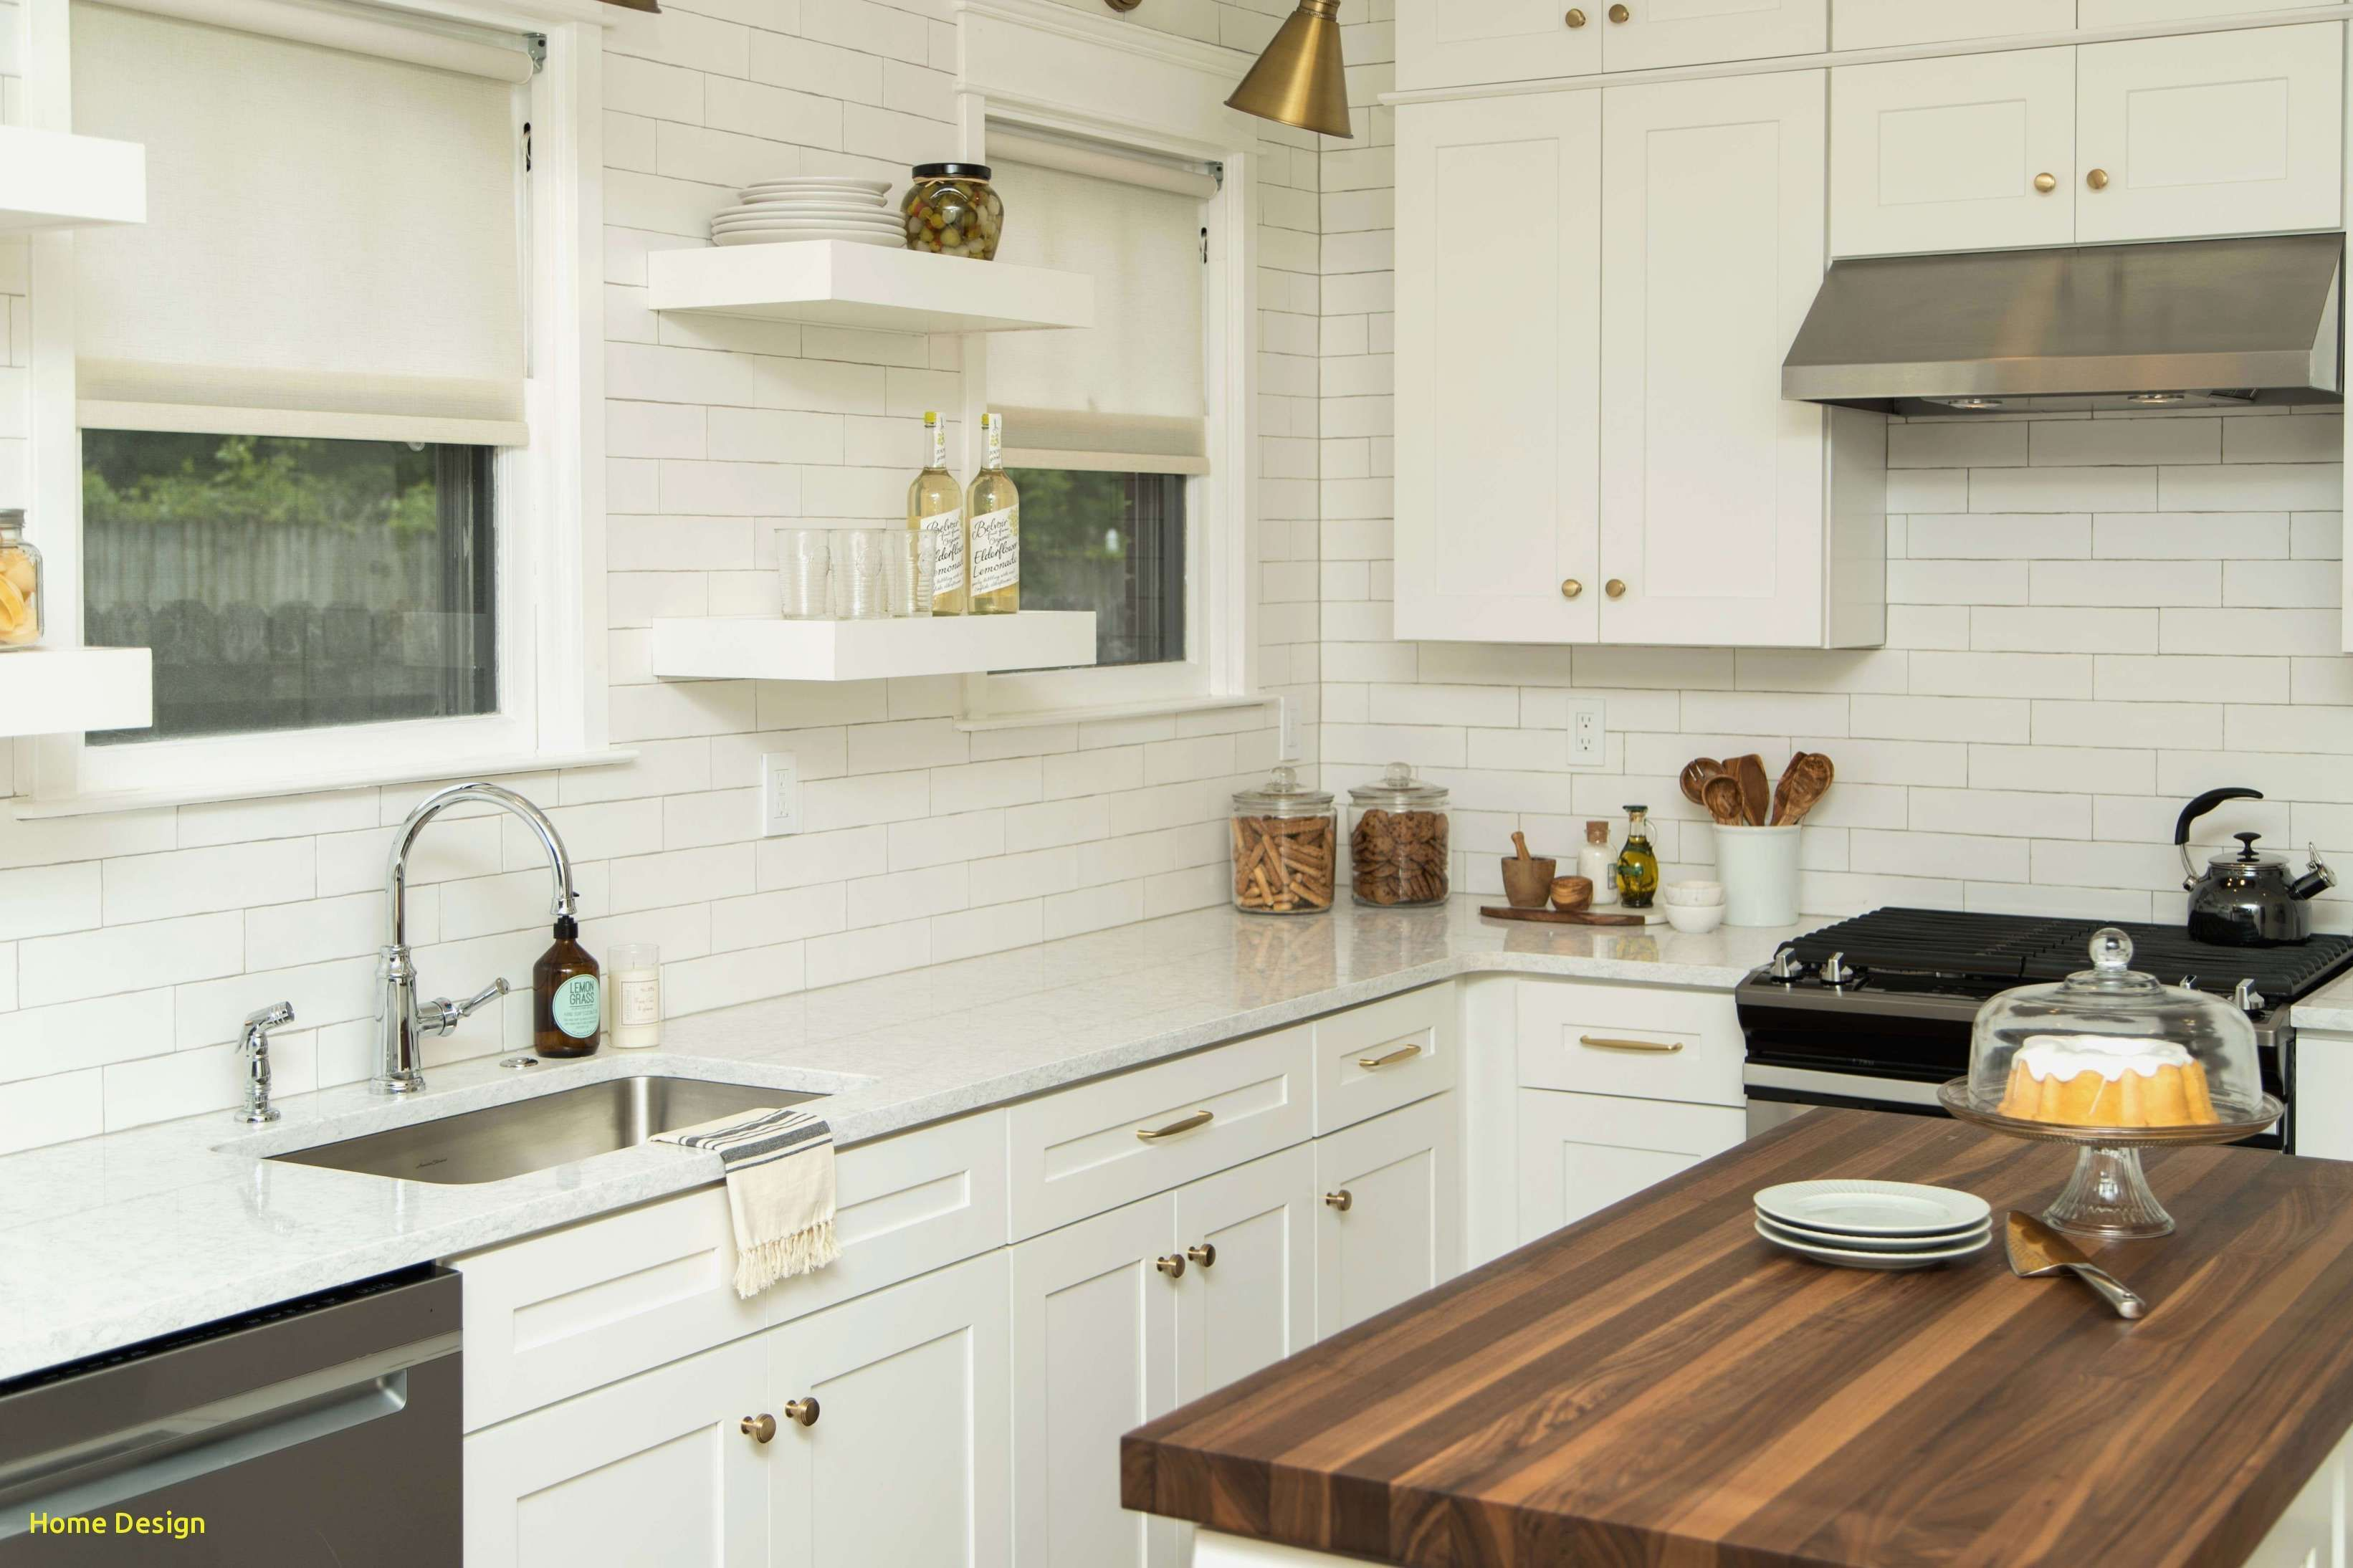 Best Of Design Your Own Kitchen homeDesign HomeDecor homeDiy ...